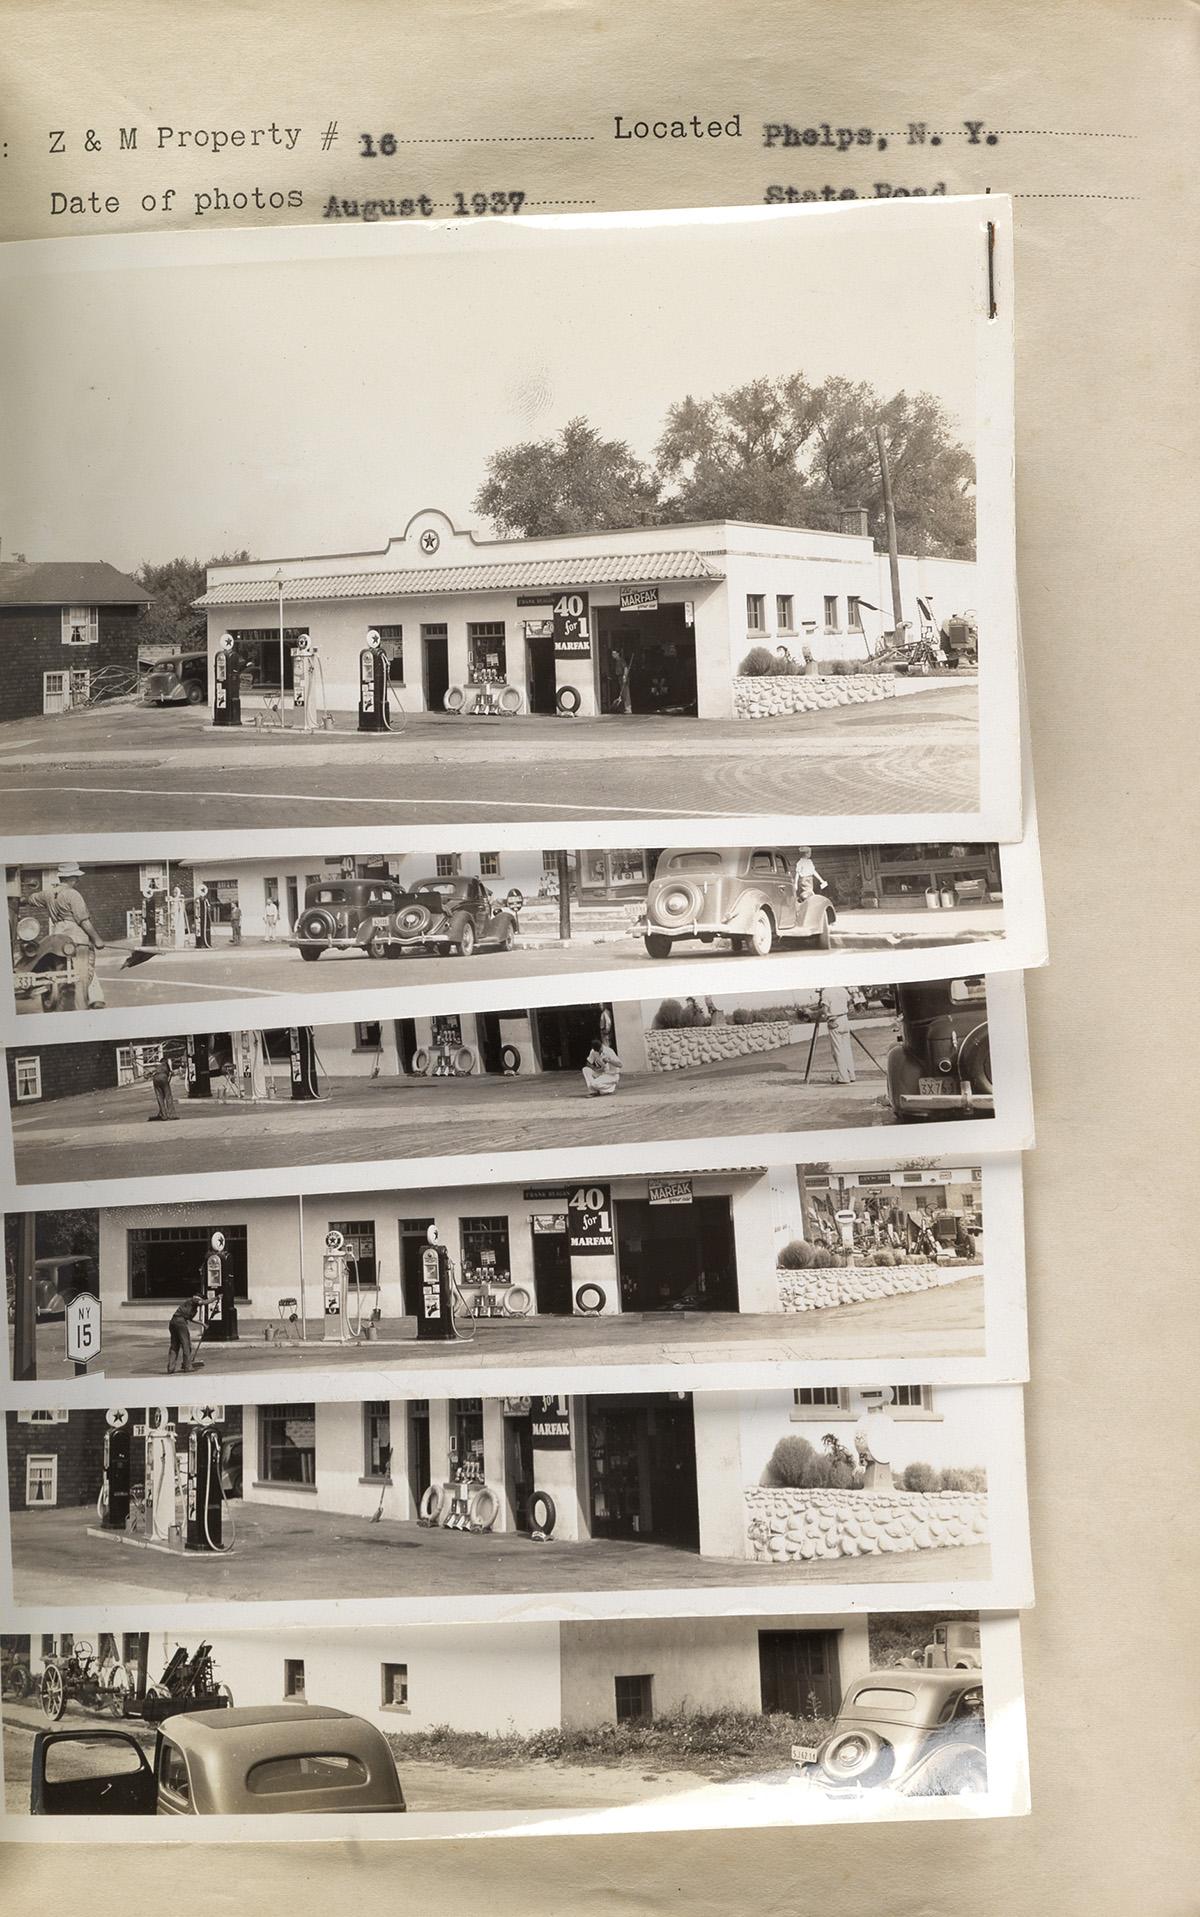 (GAS-STATIONS--TEXACO)-Abum-with-320-photographs-of-Texaco-g